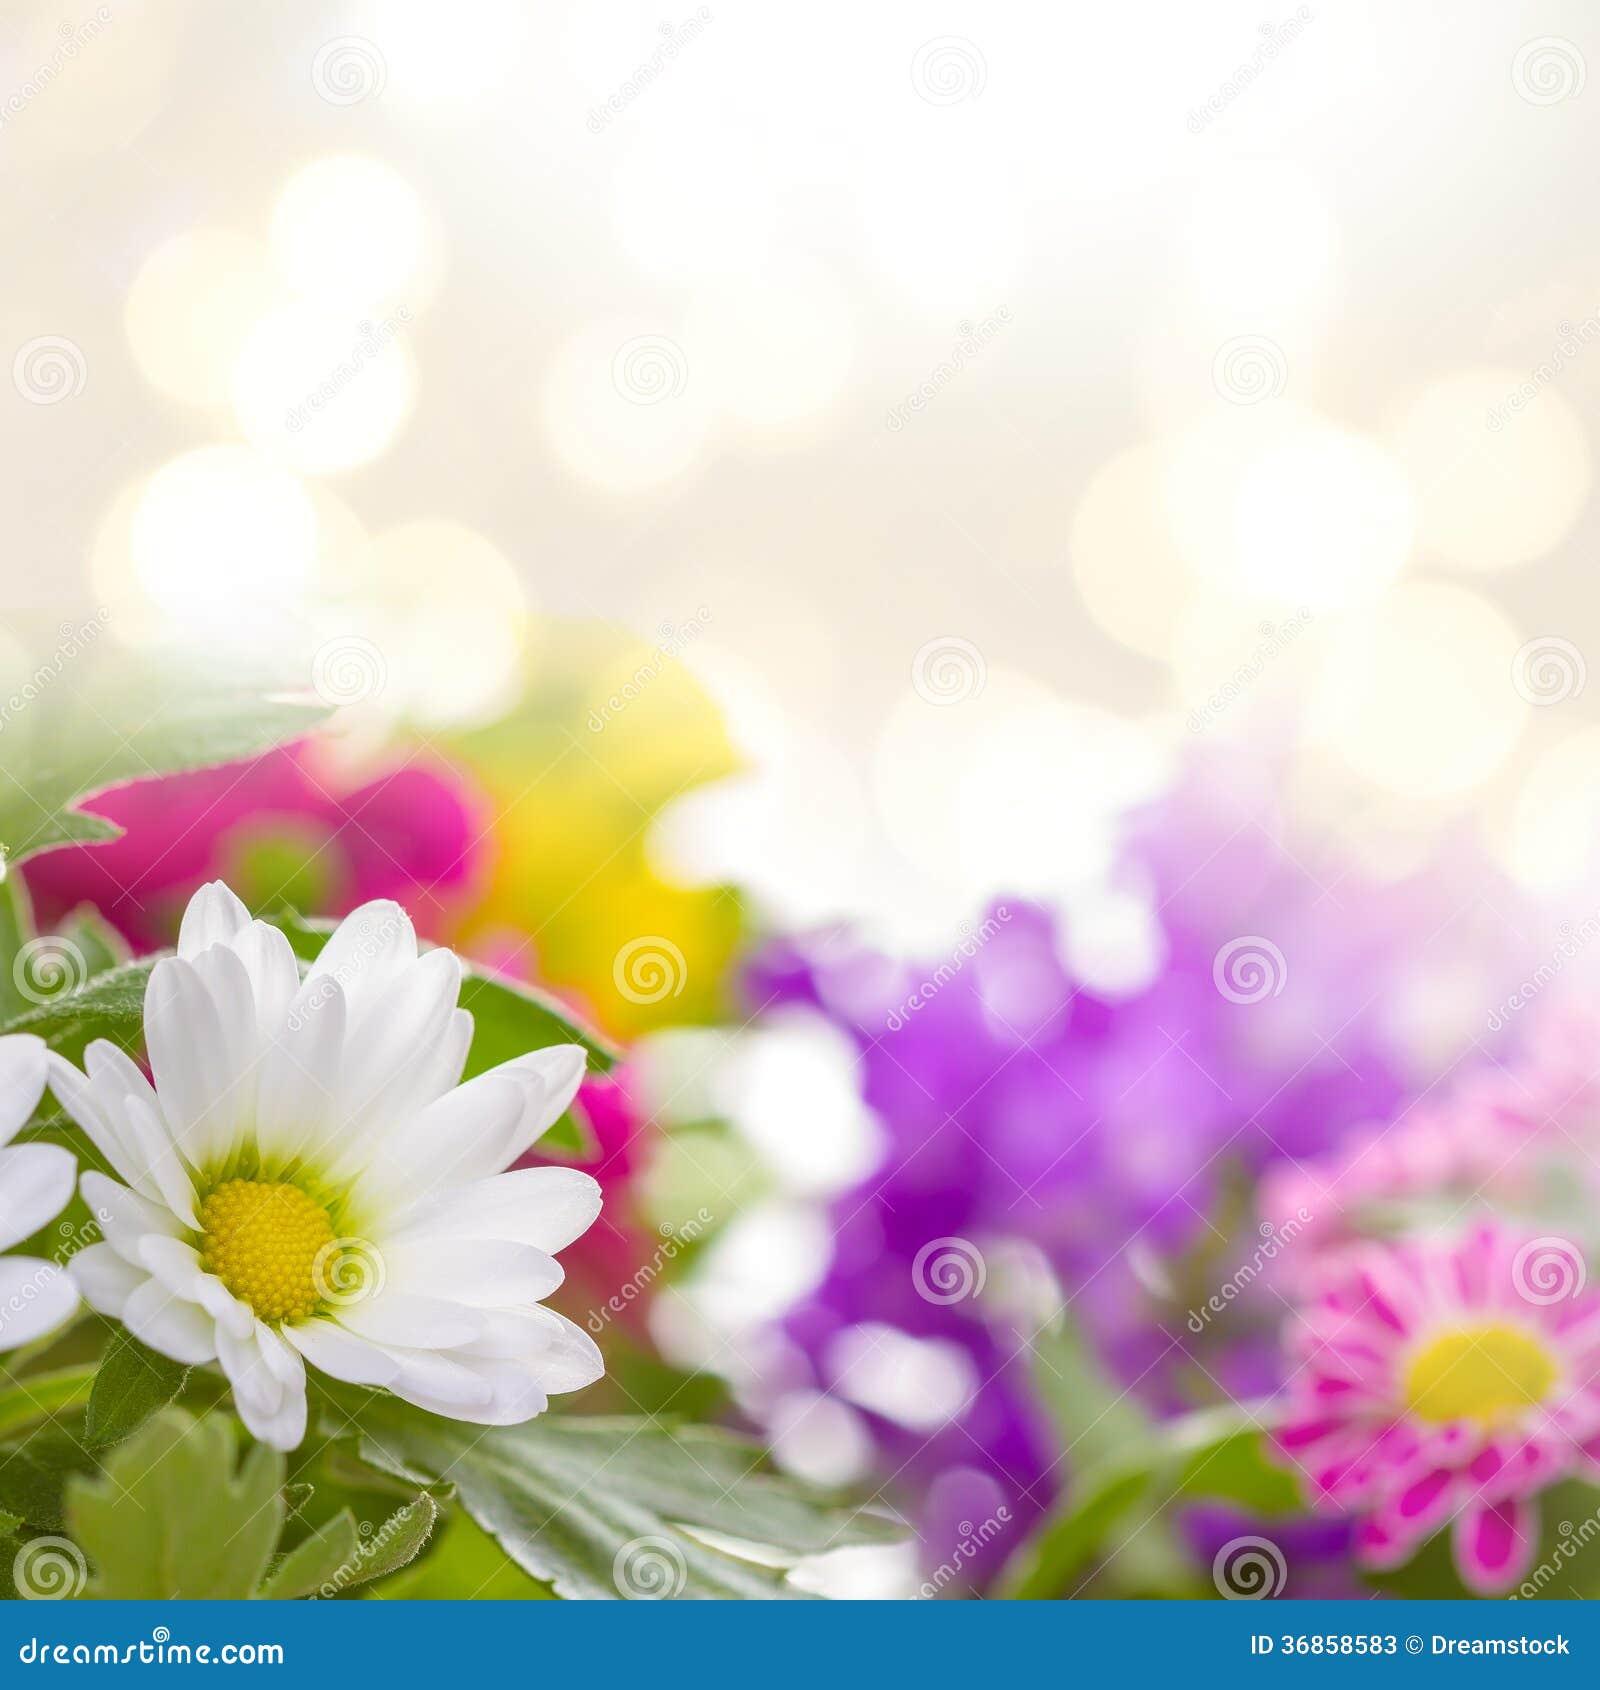 spring flowers stock illustration image of illustration